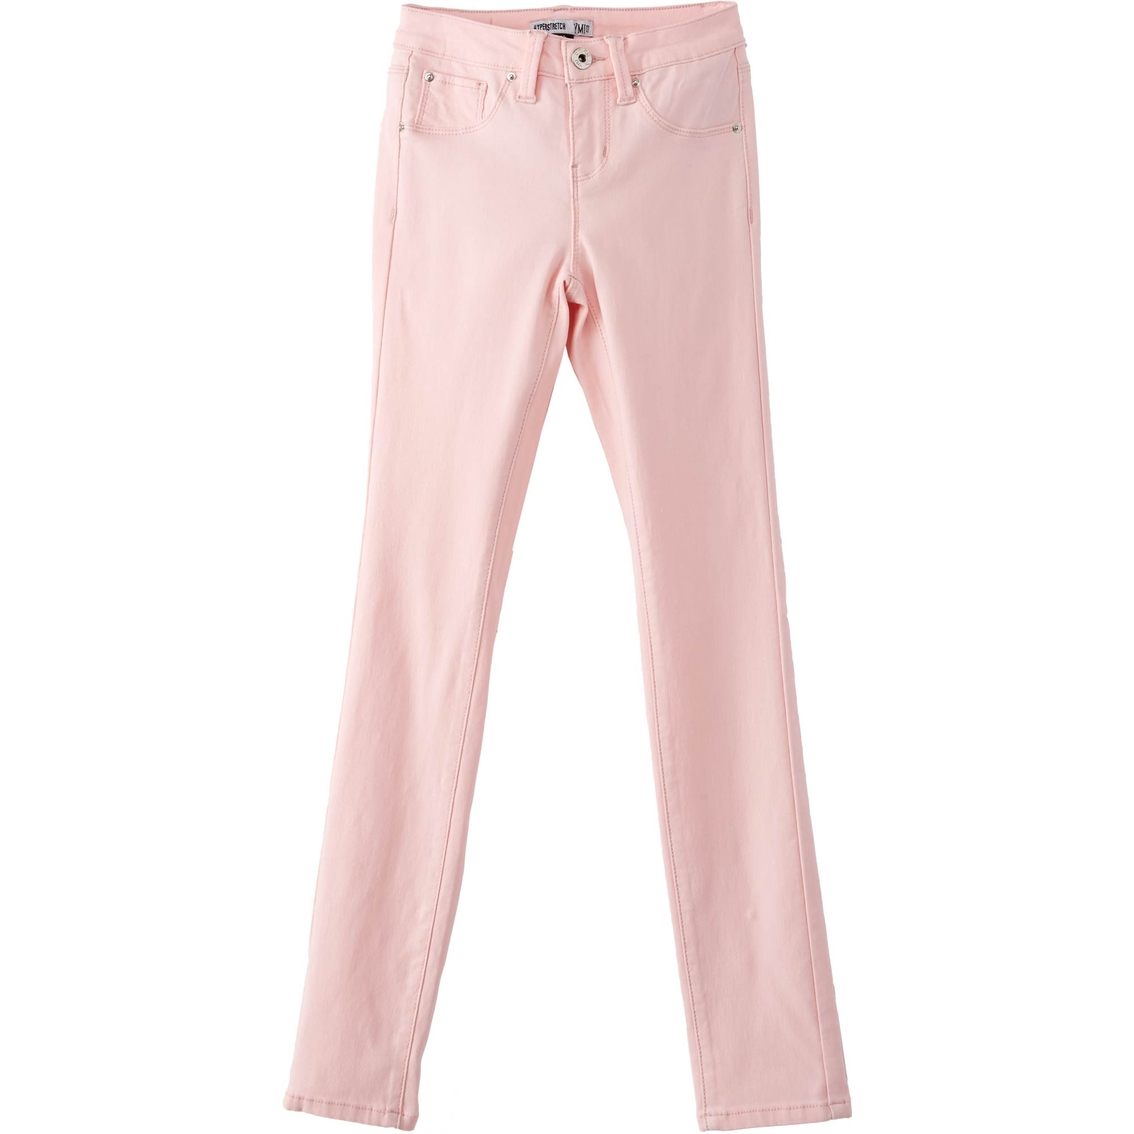 05c7f081bd04e Ymi Girls Hyperstretch Skinny Jeans | Girls 7-16 | Apparel | Shop ...